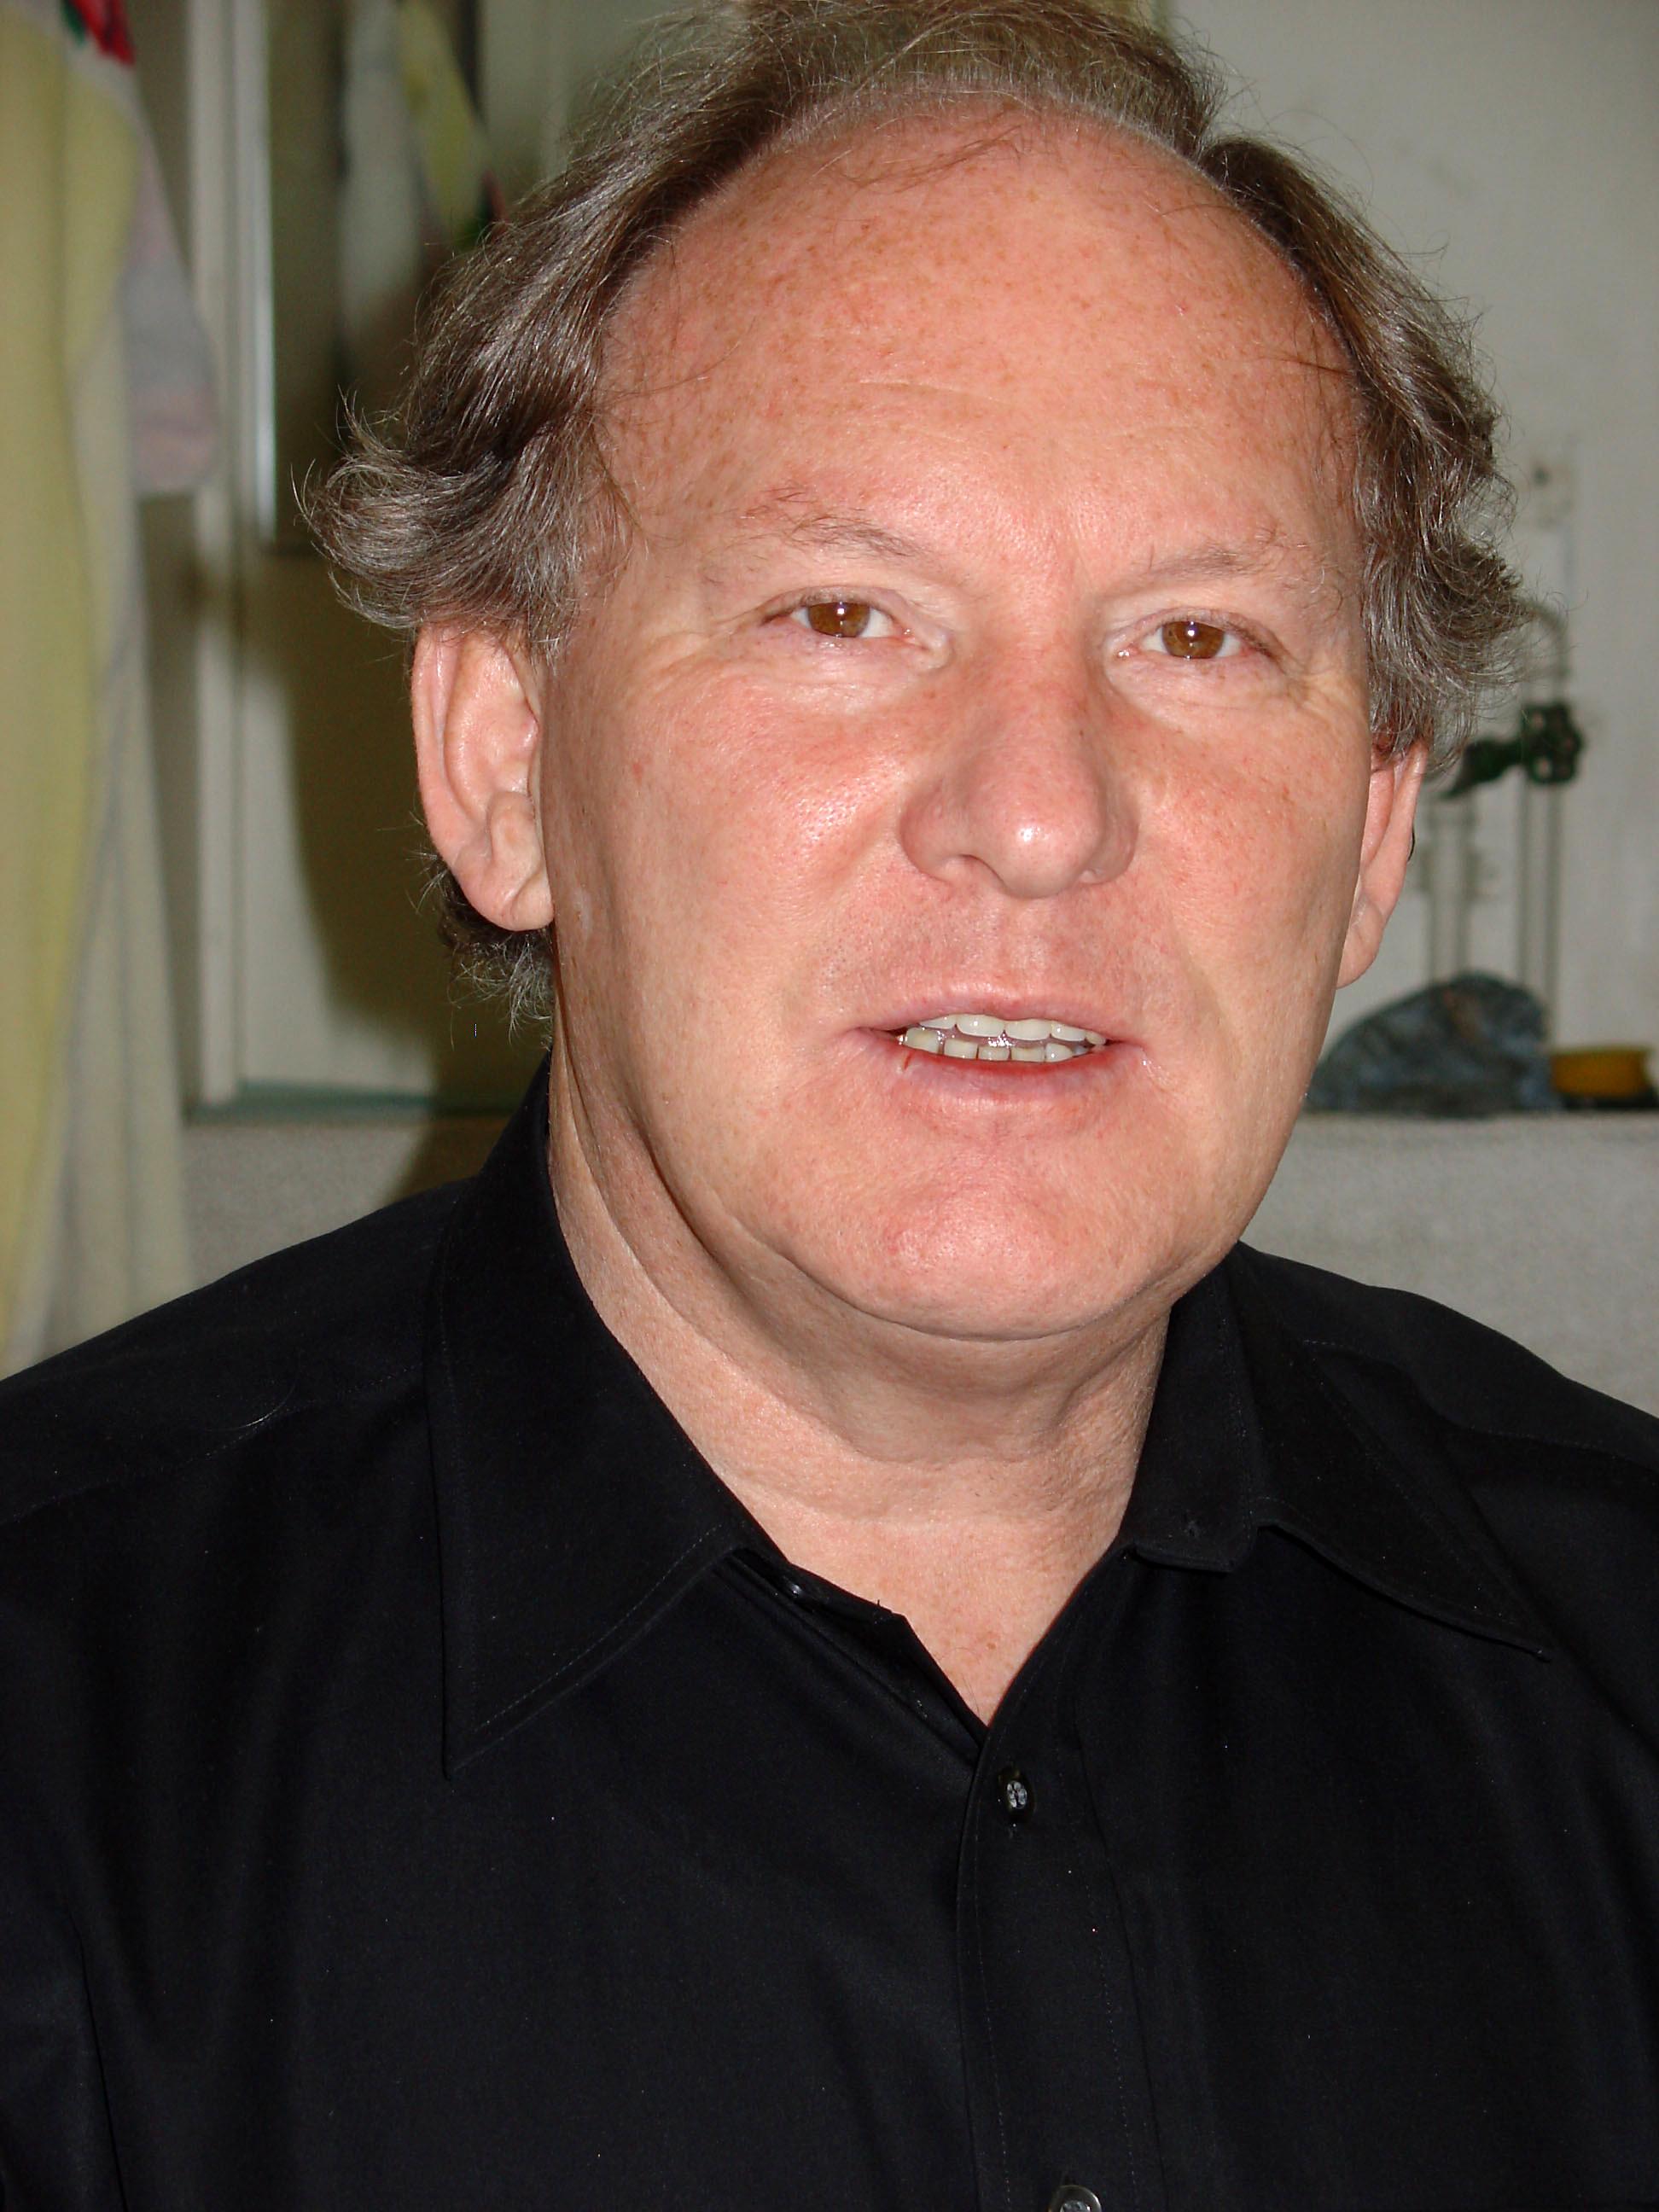 Prof. Dr. Eckhard Schollmeyer